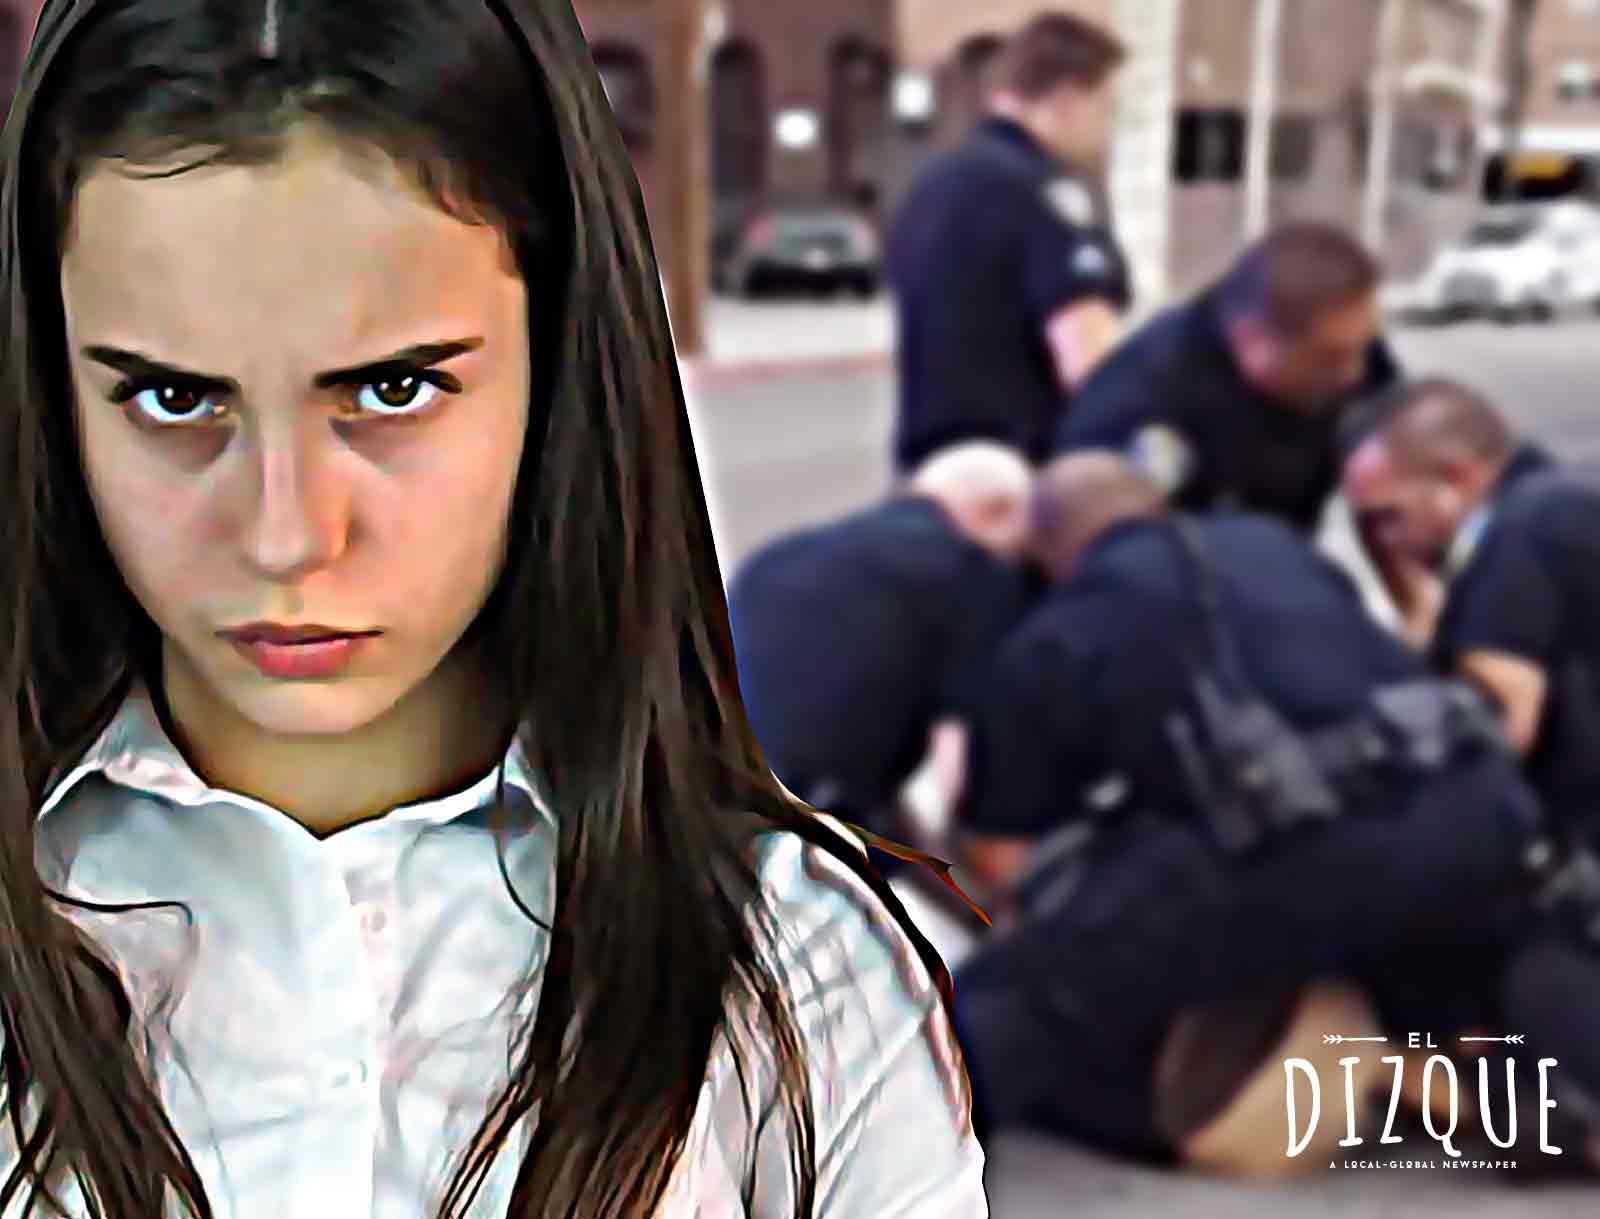 Alumna denuncia a maestro por mansplaining